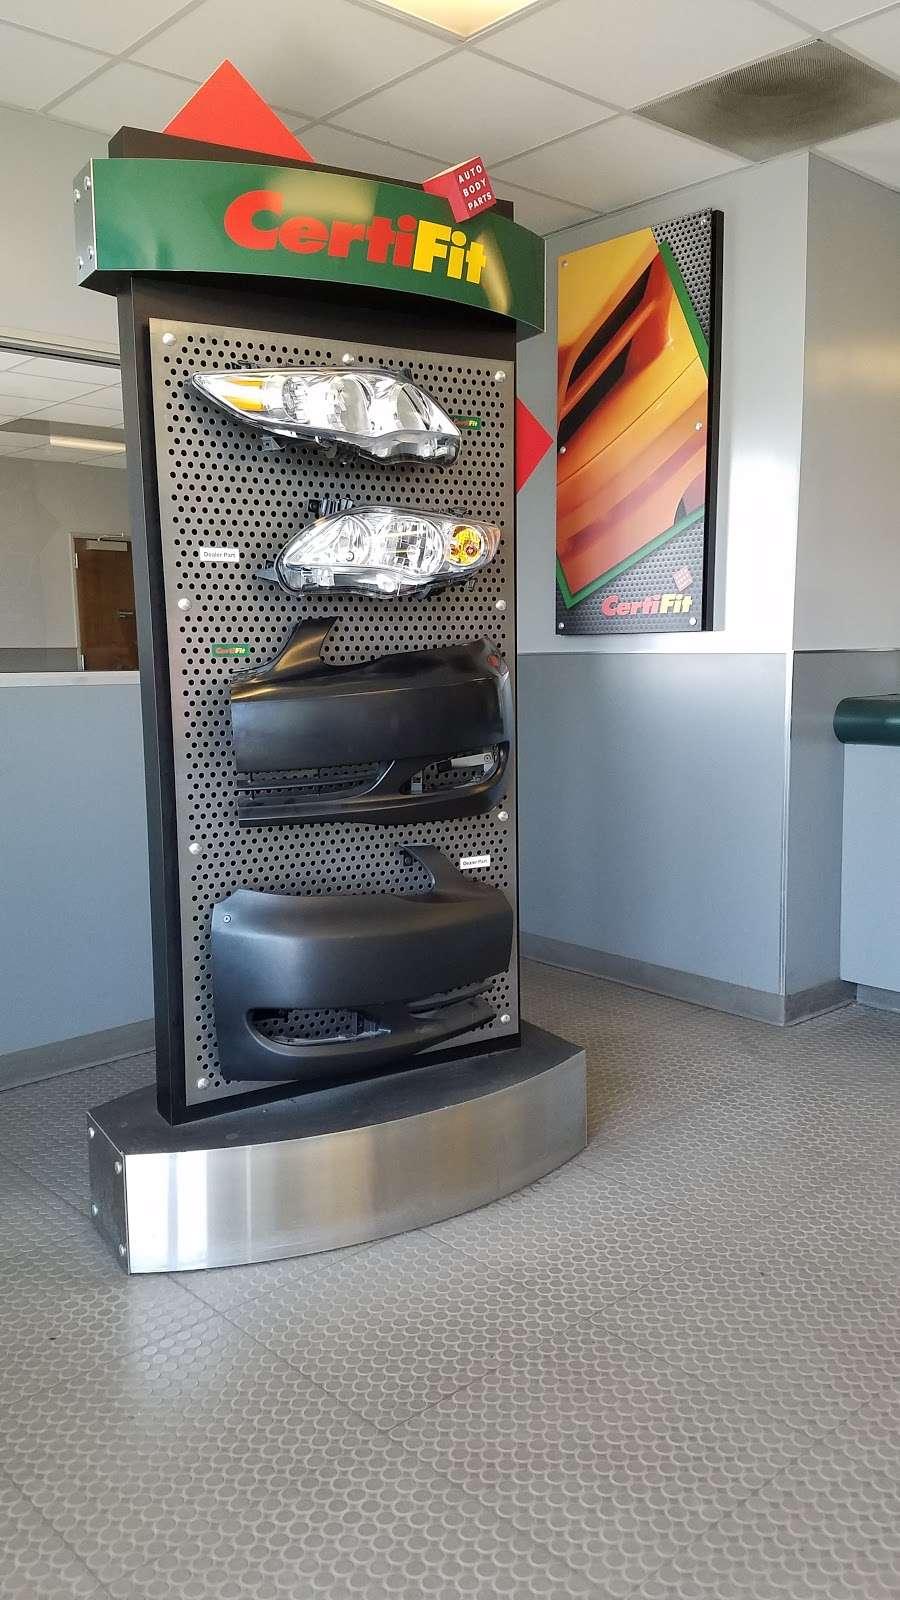 Certifit Auto Body Parts - car repair  | Photo 1 of 10 | Address: 1440 Innovative Dr, San Diego, CA 92154, USA | Phone: (619) 661-6274